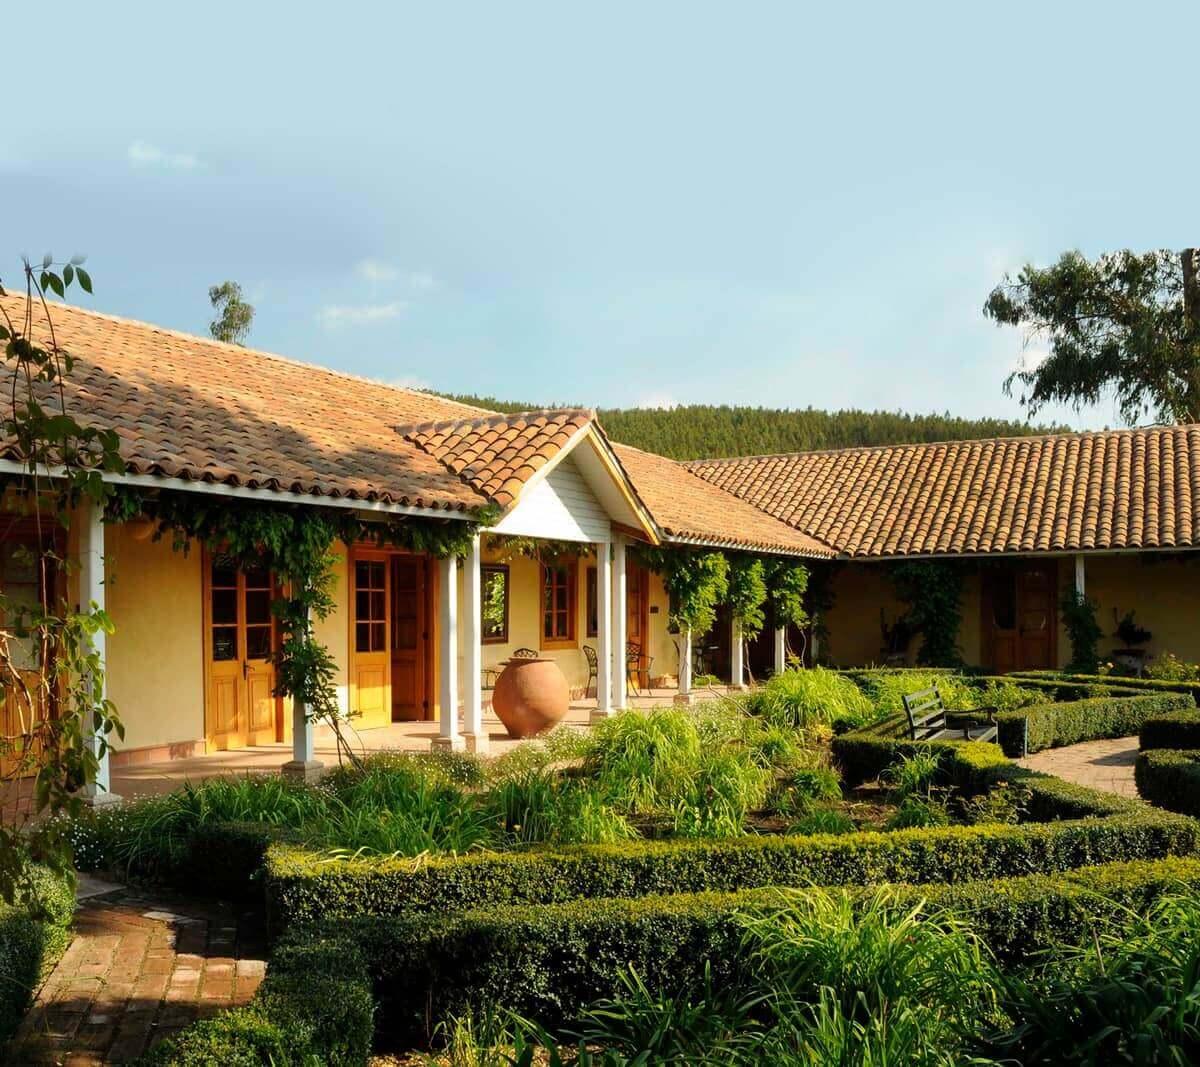 Chile - Matetic Vineyard